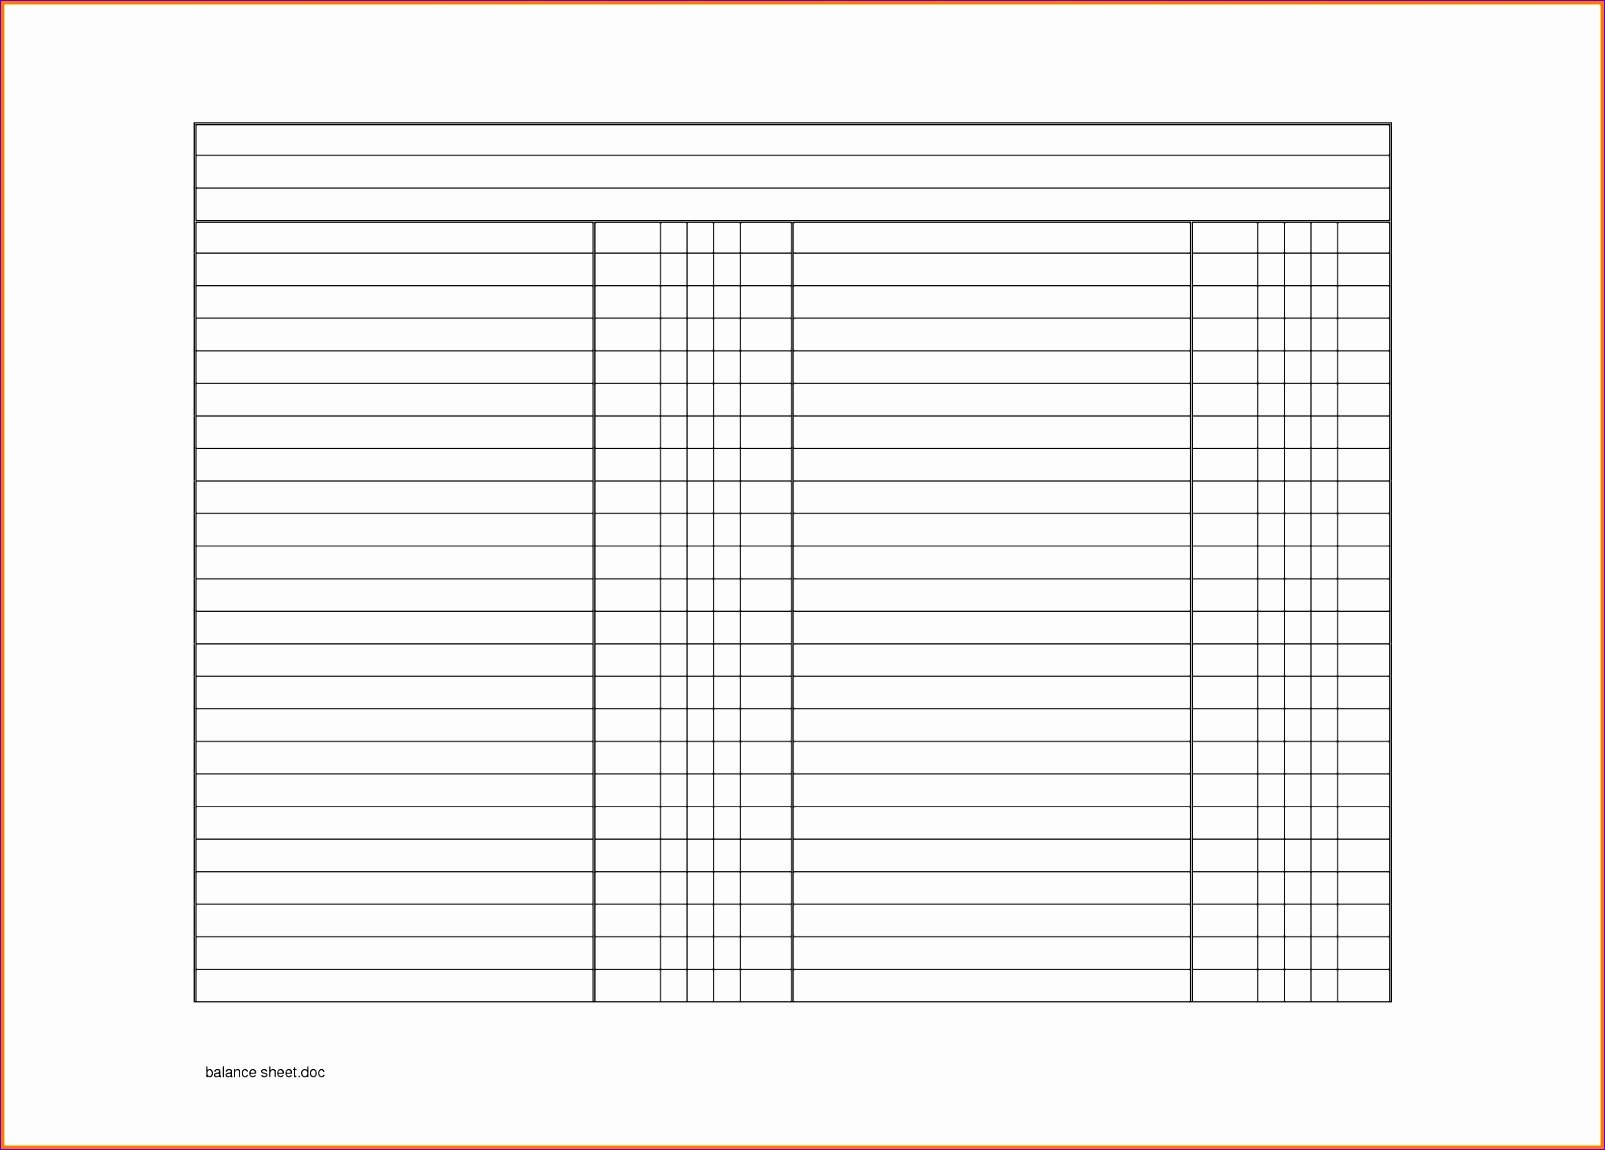 Excel Address Book Template Lovely 9 Address Book Excel Template Exceltemplates